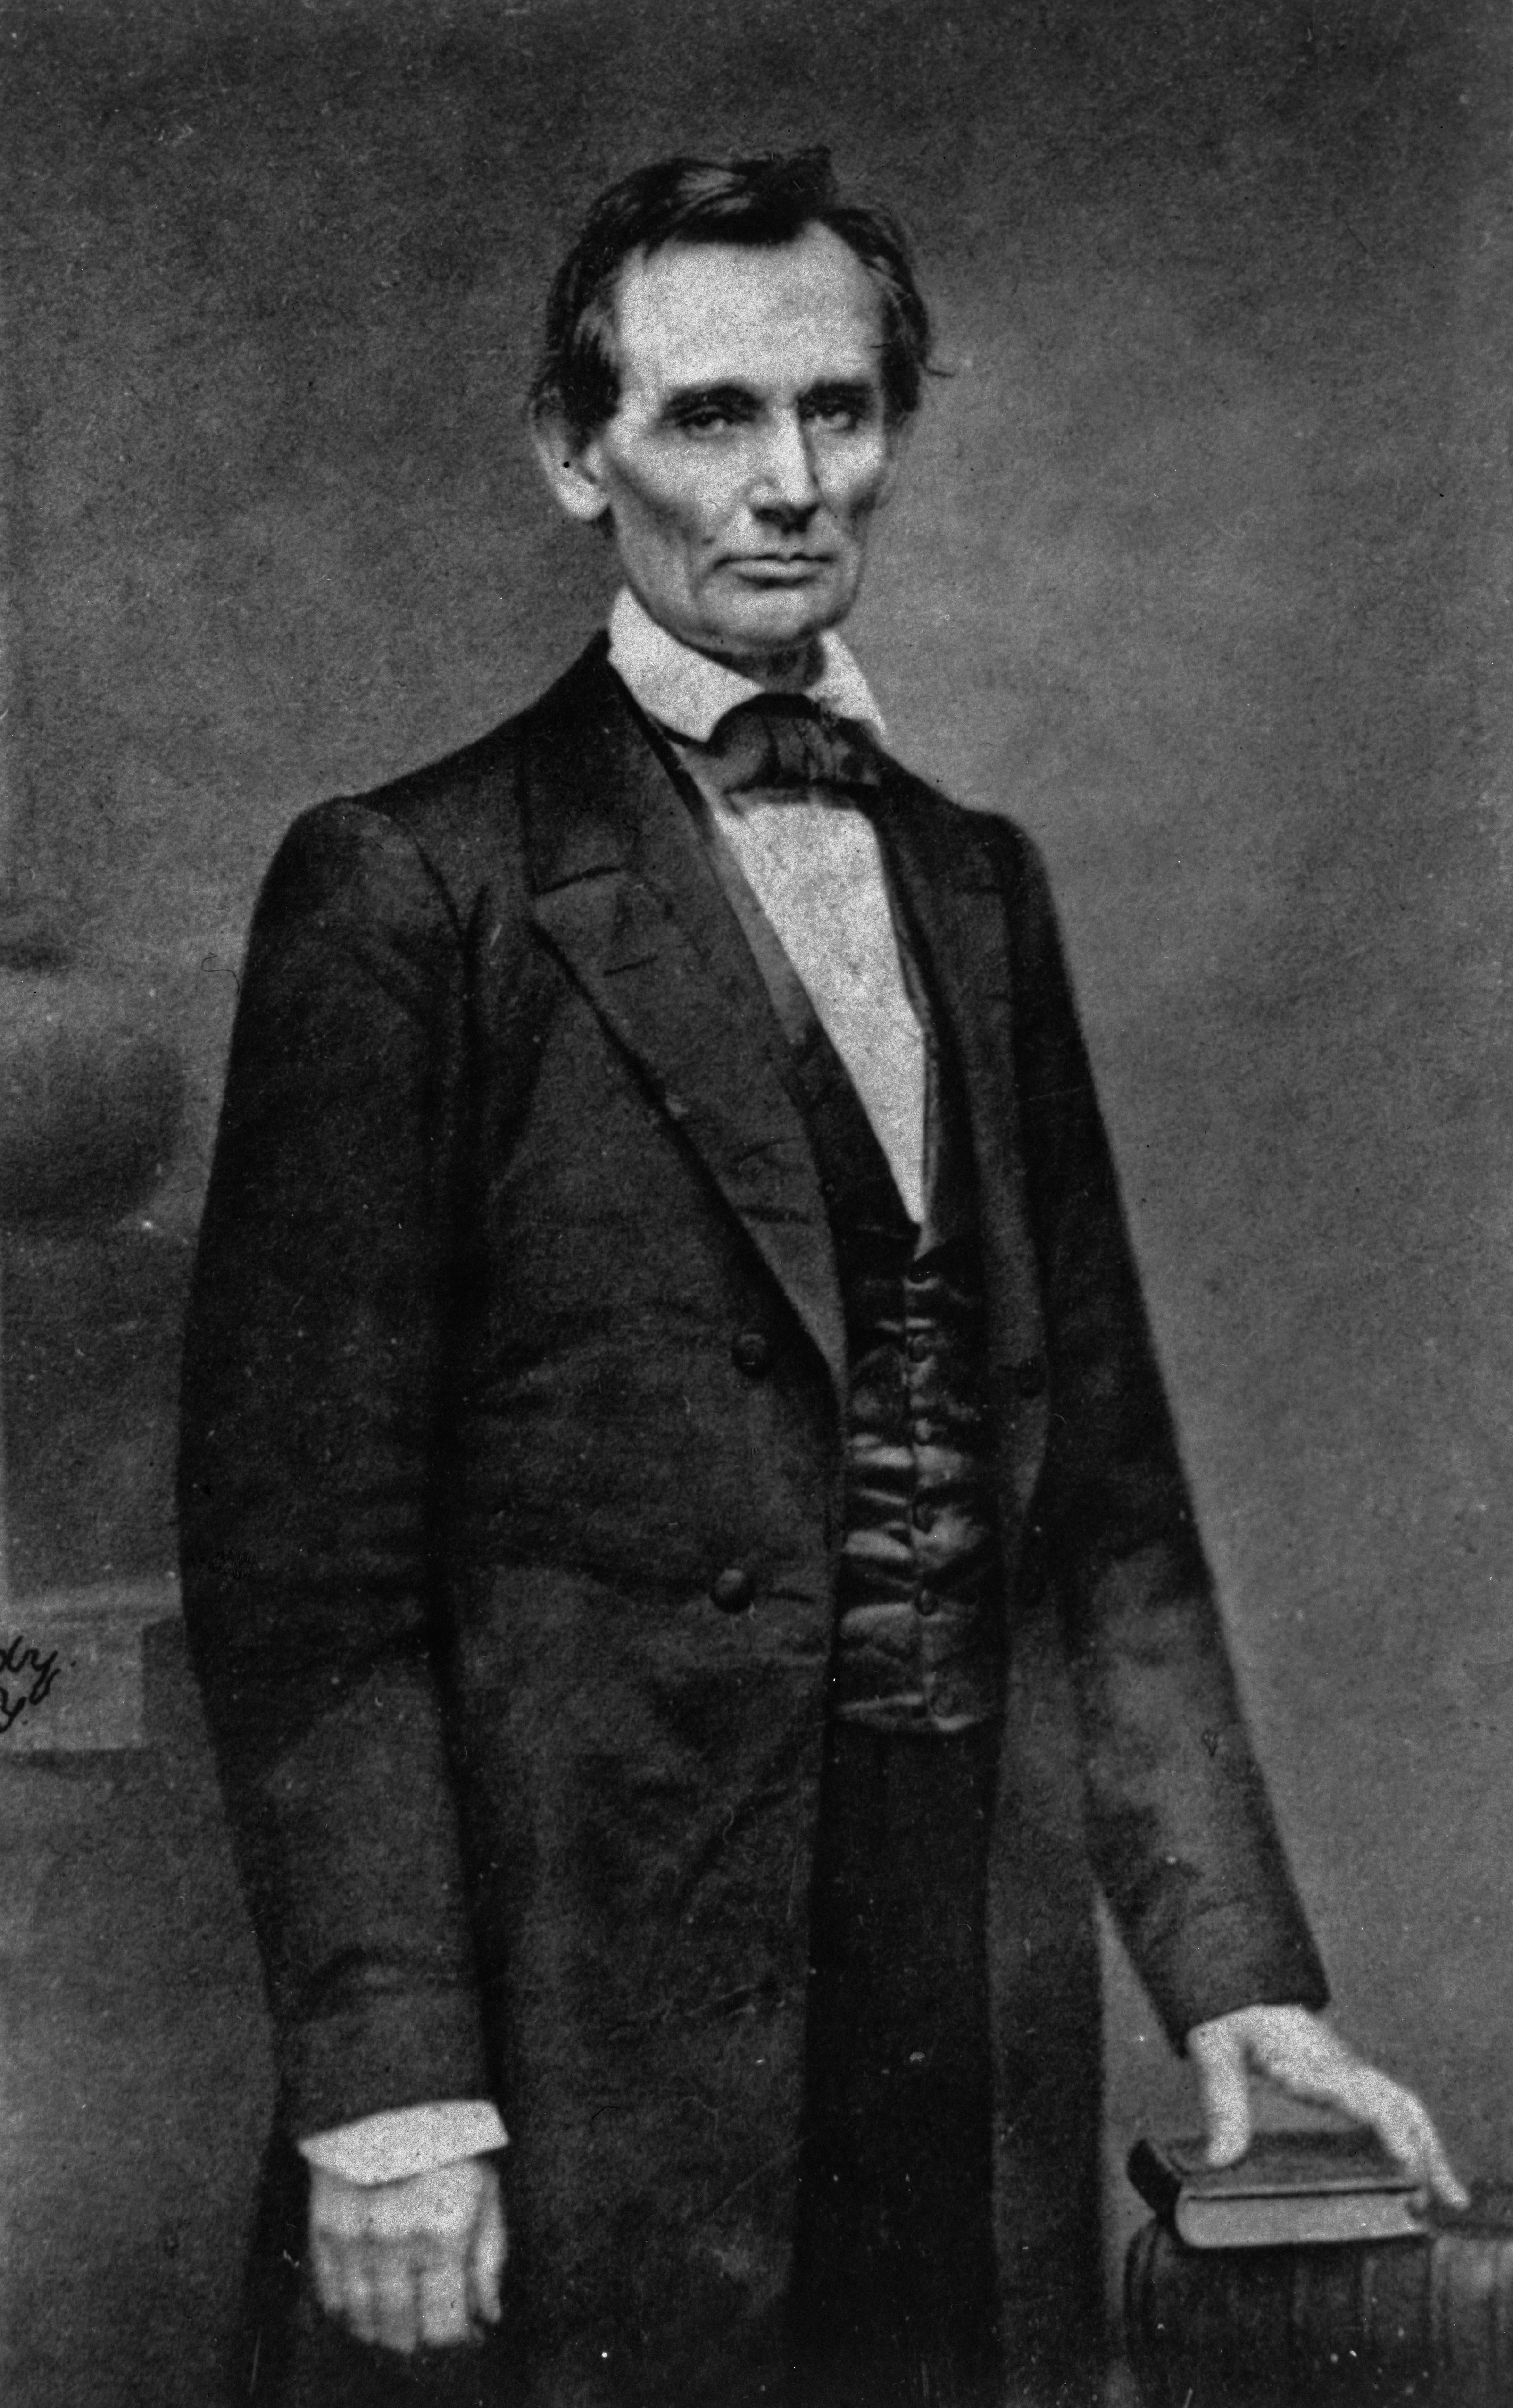 File:Abraham Lincoln 1860.jpg